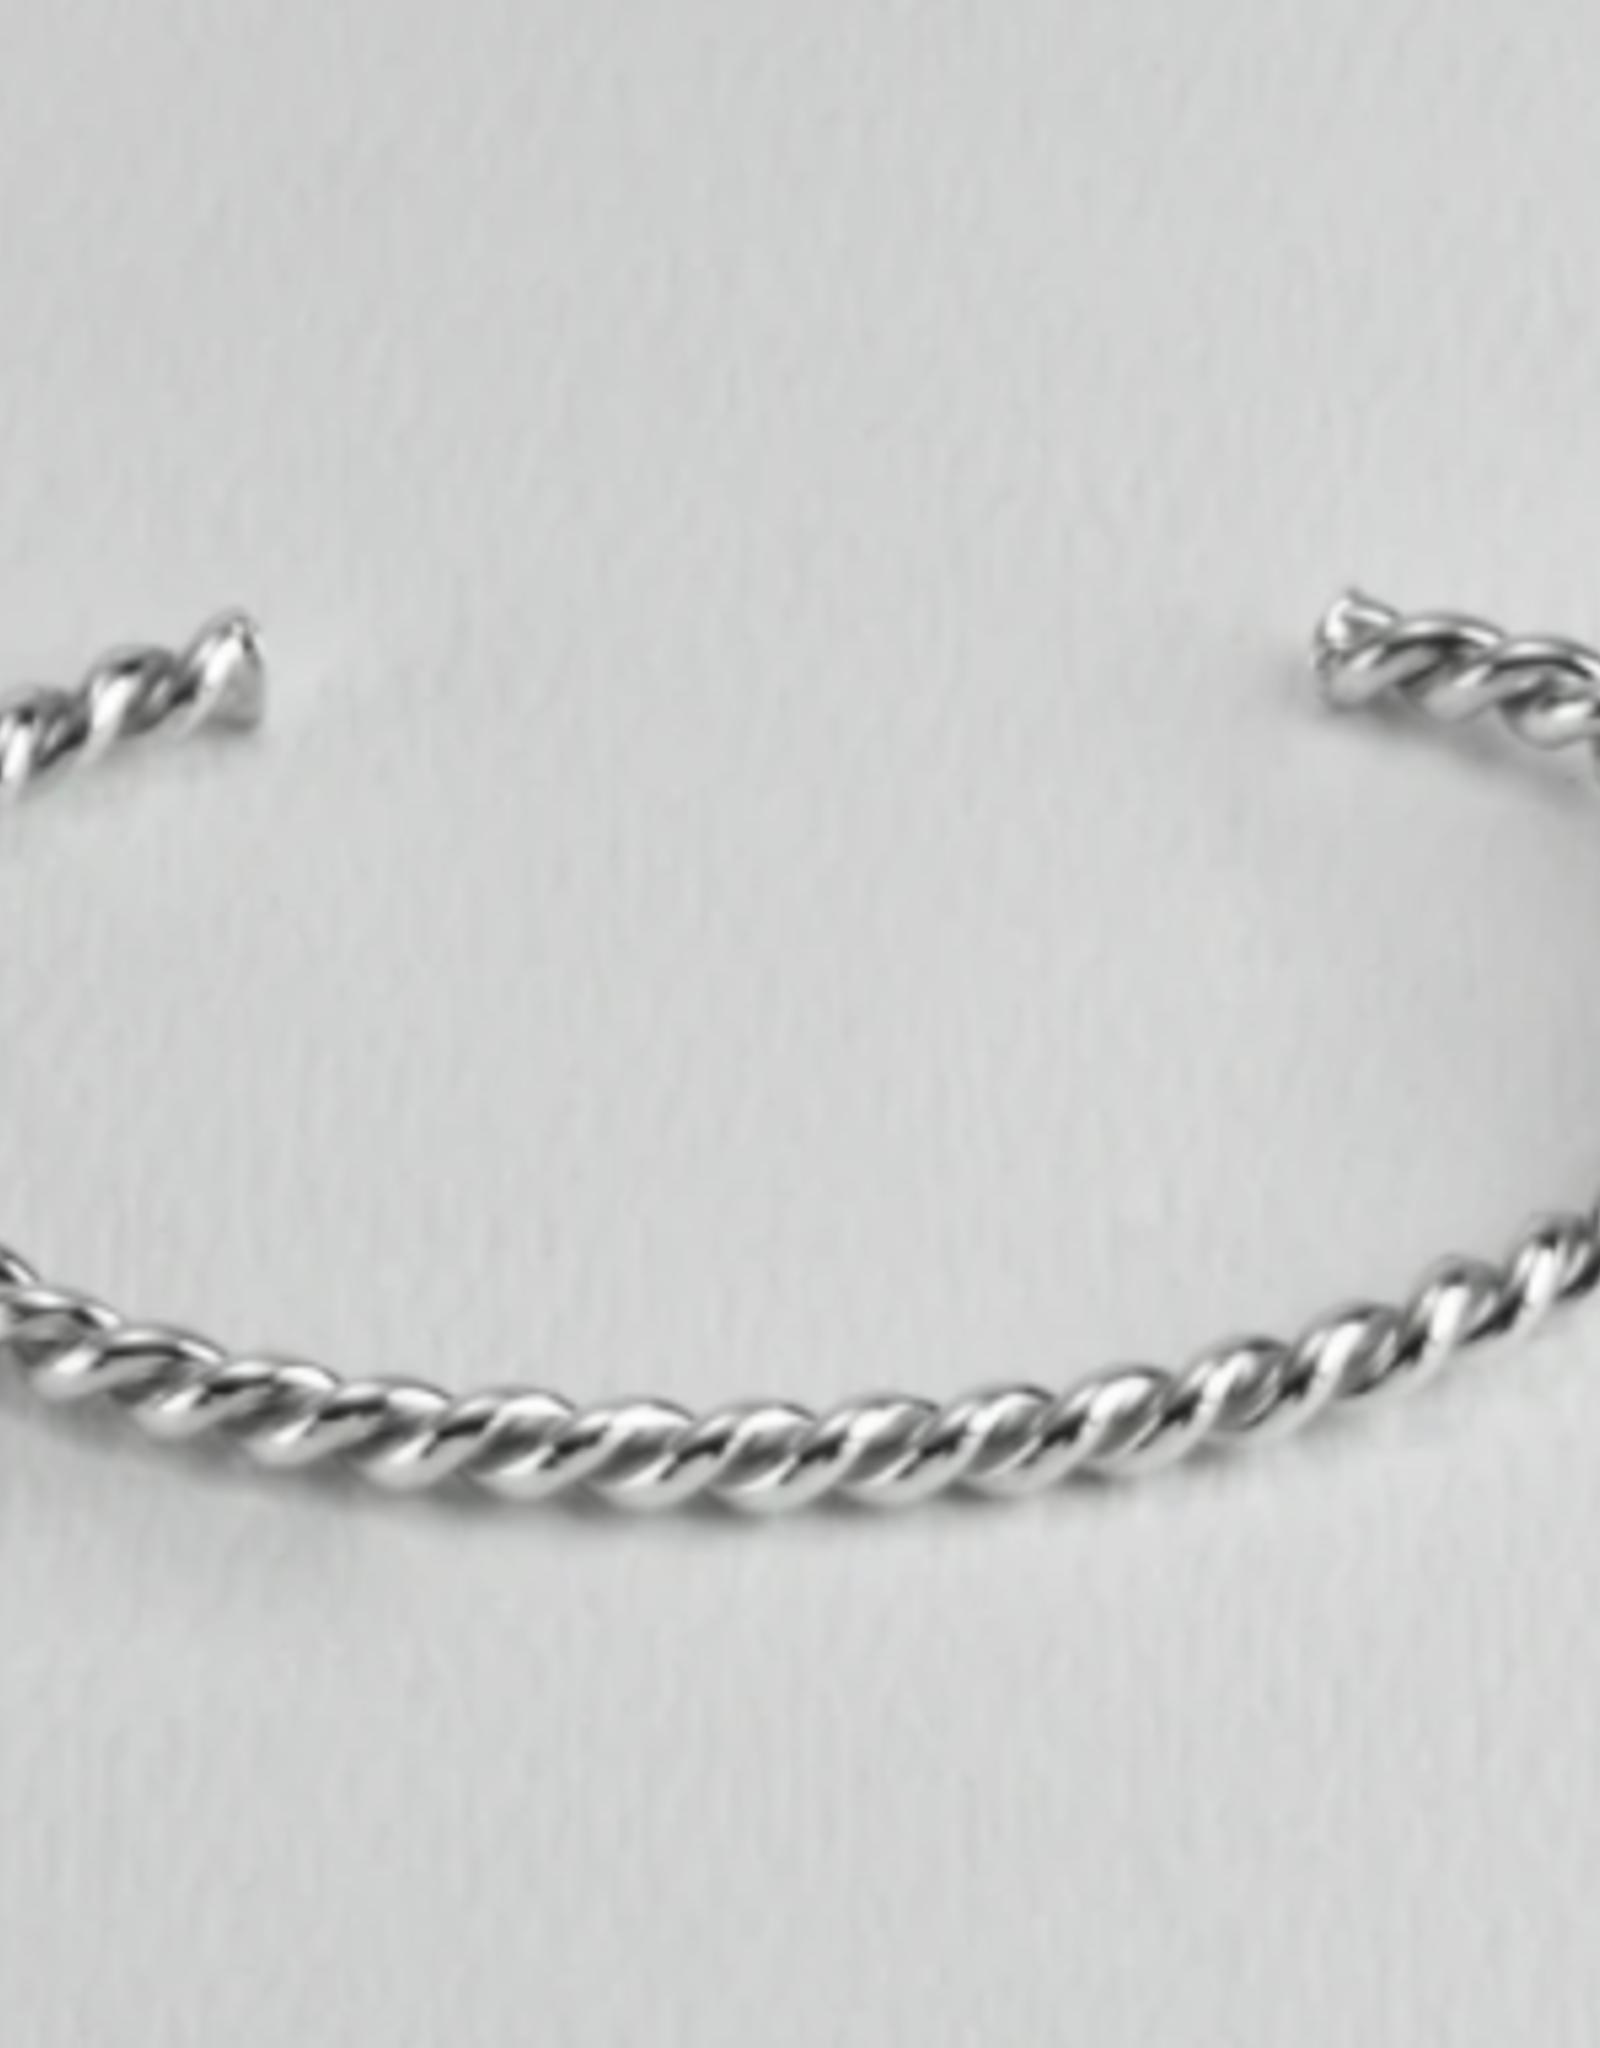 Twisted Silver Cuff-Stout